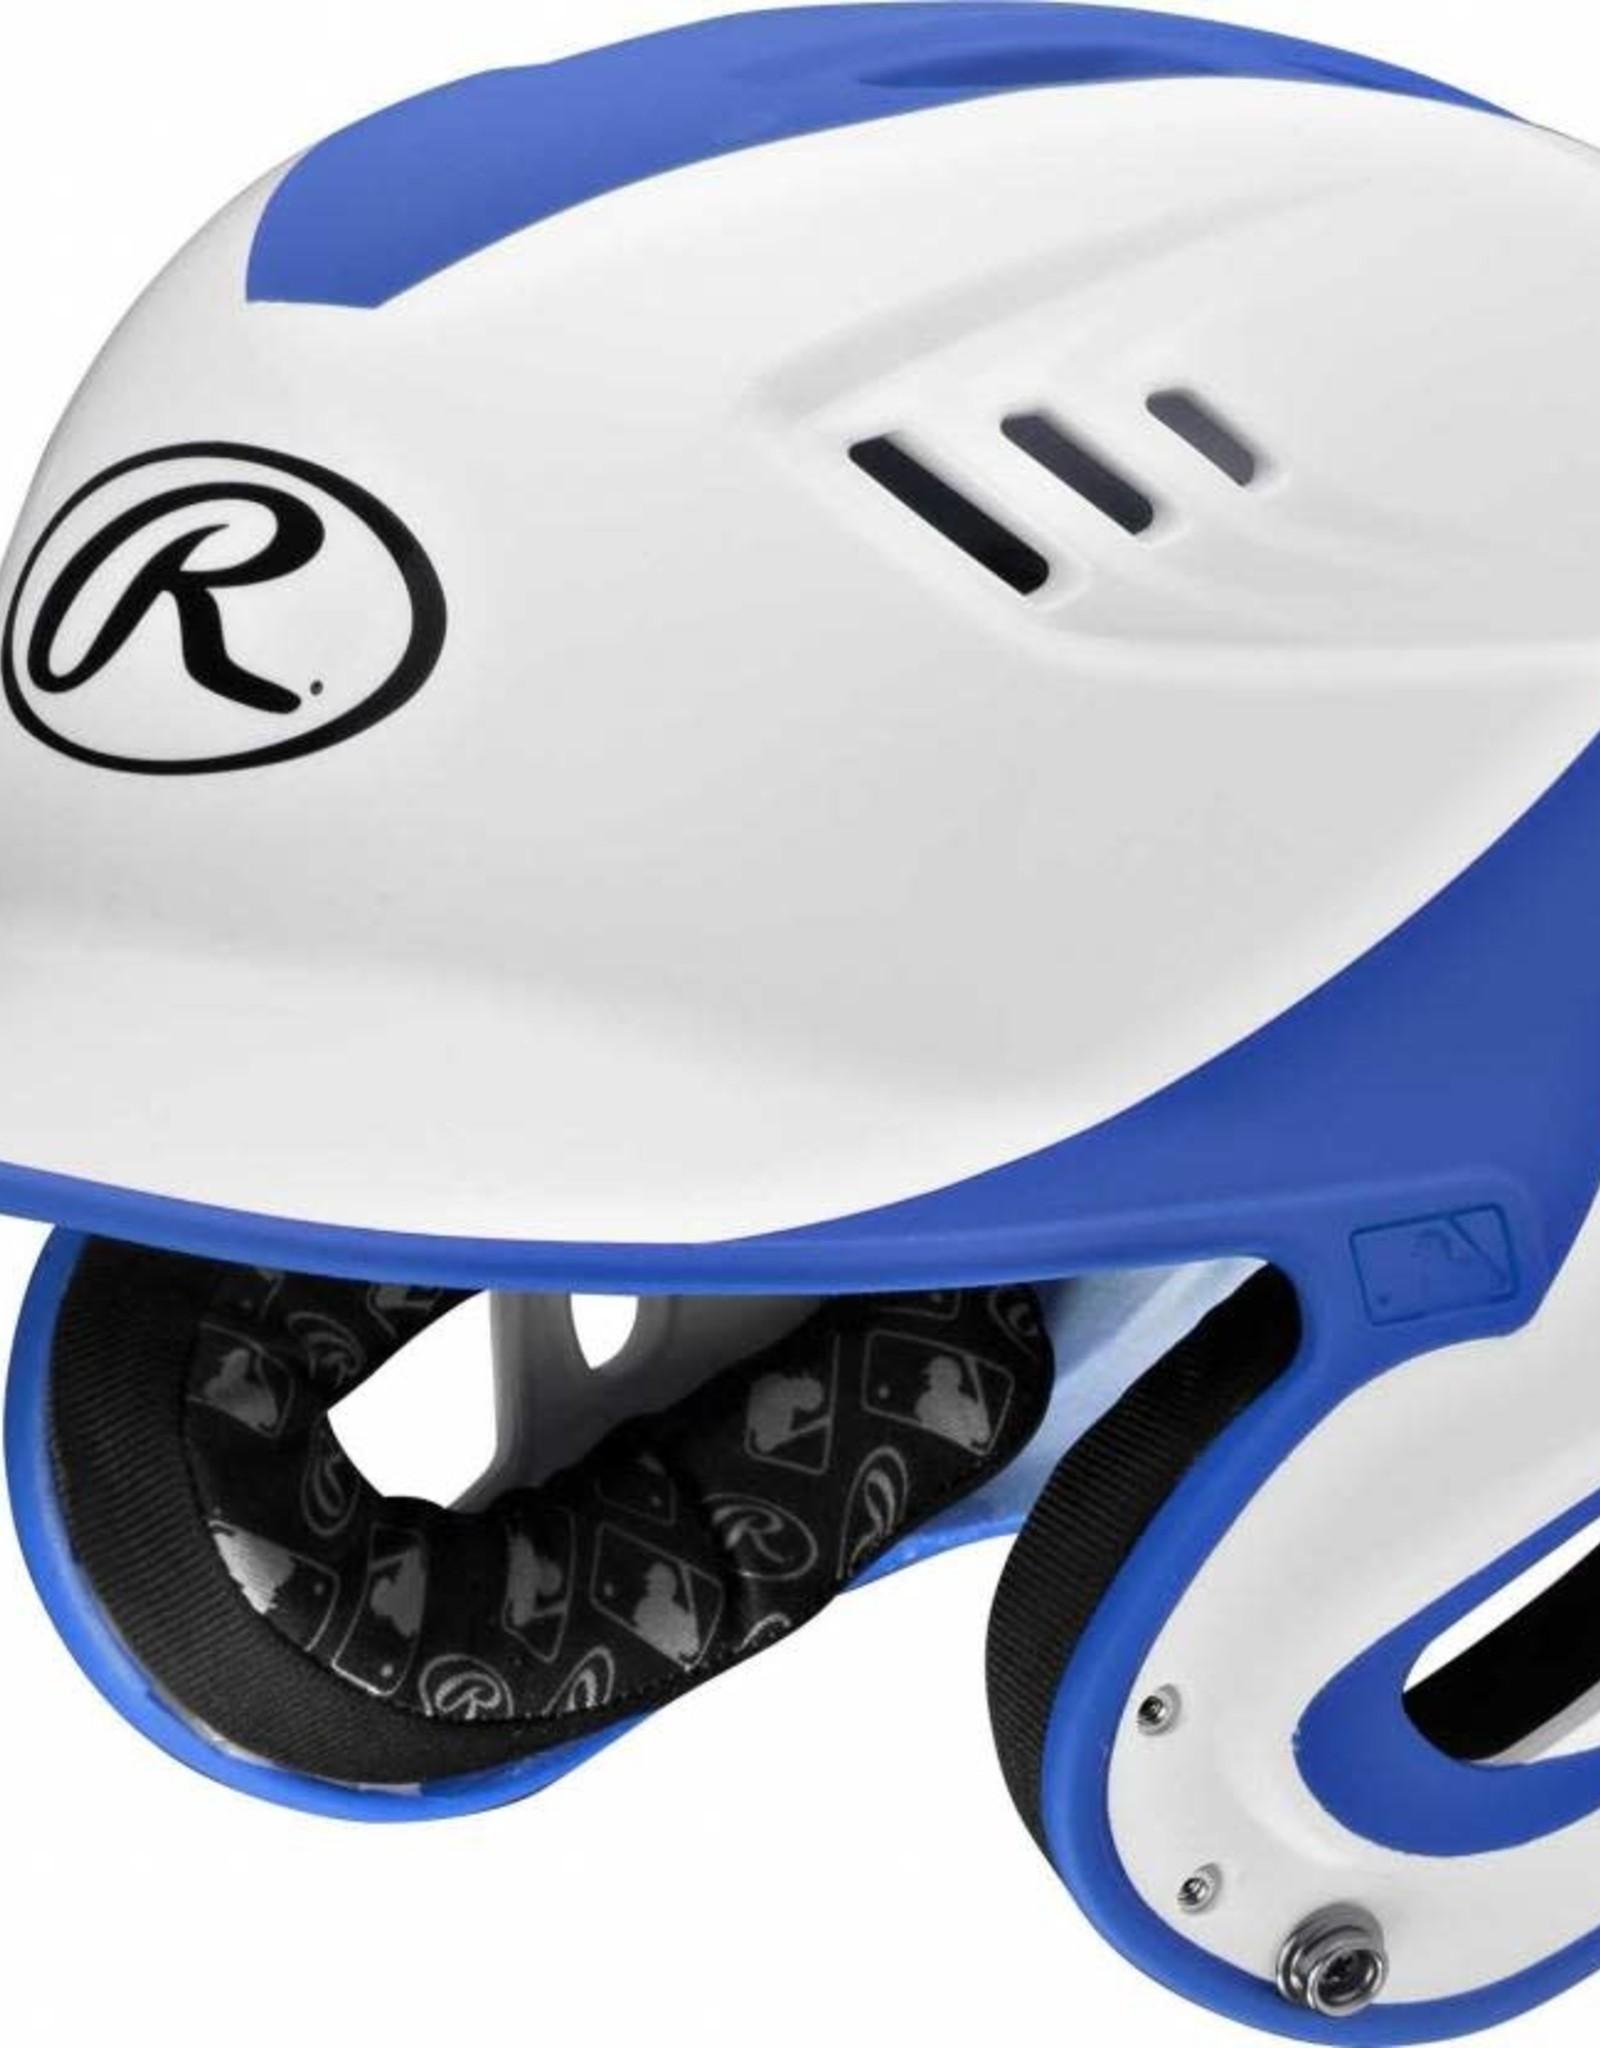 Rawlings Velo Junior Batting Helmet